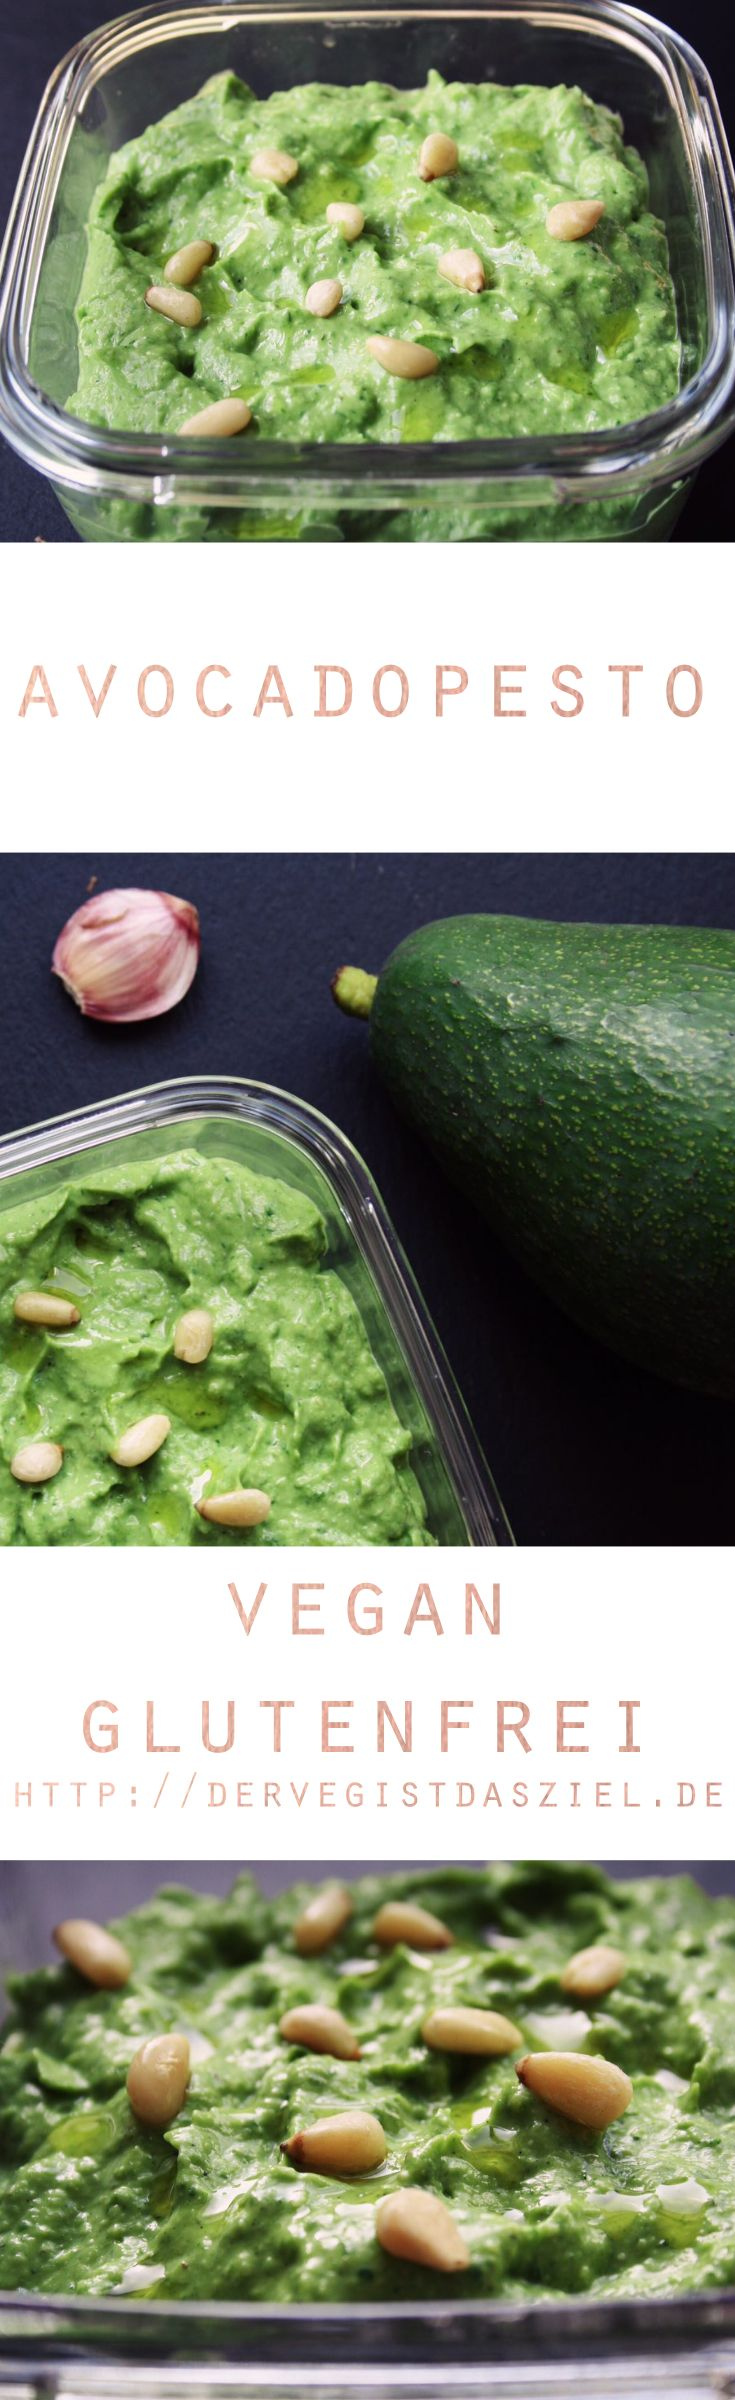 Einfaches und sehr leckeres Avocadopesto